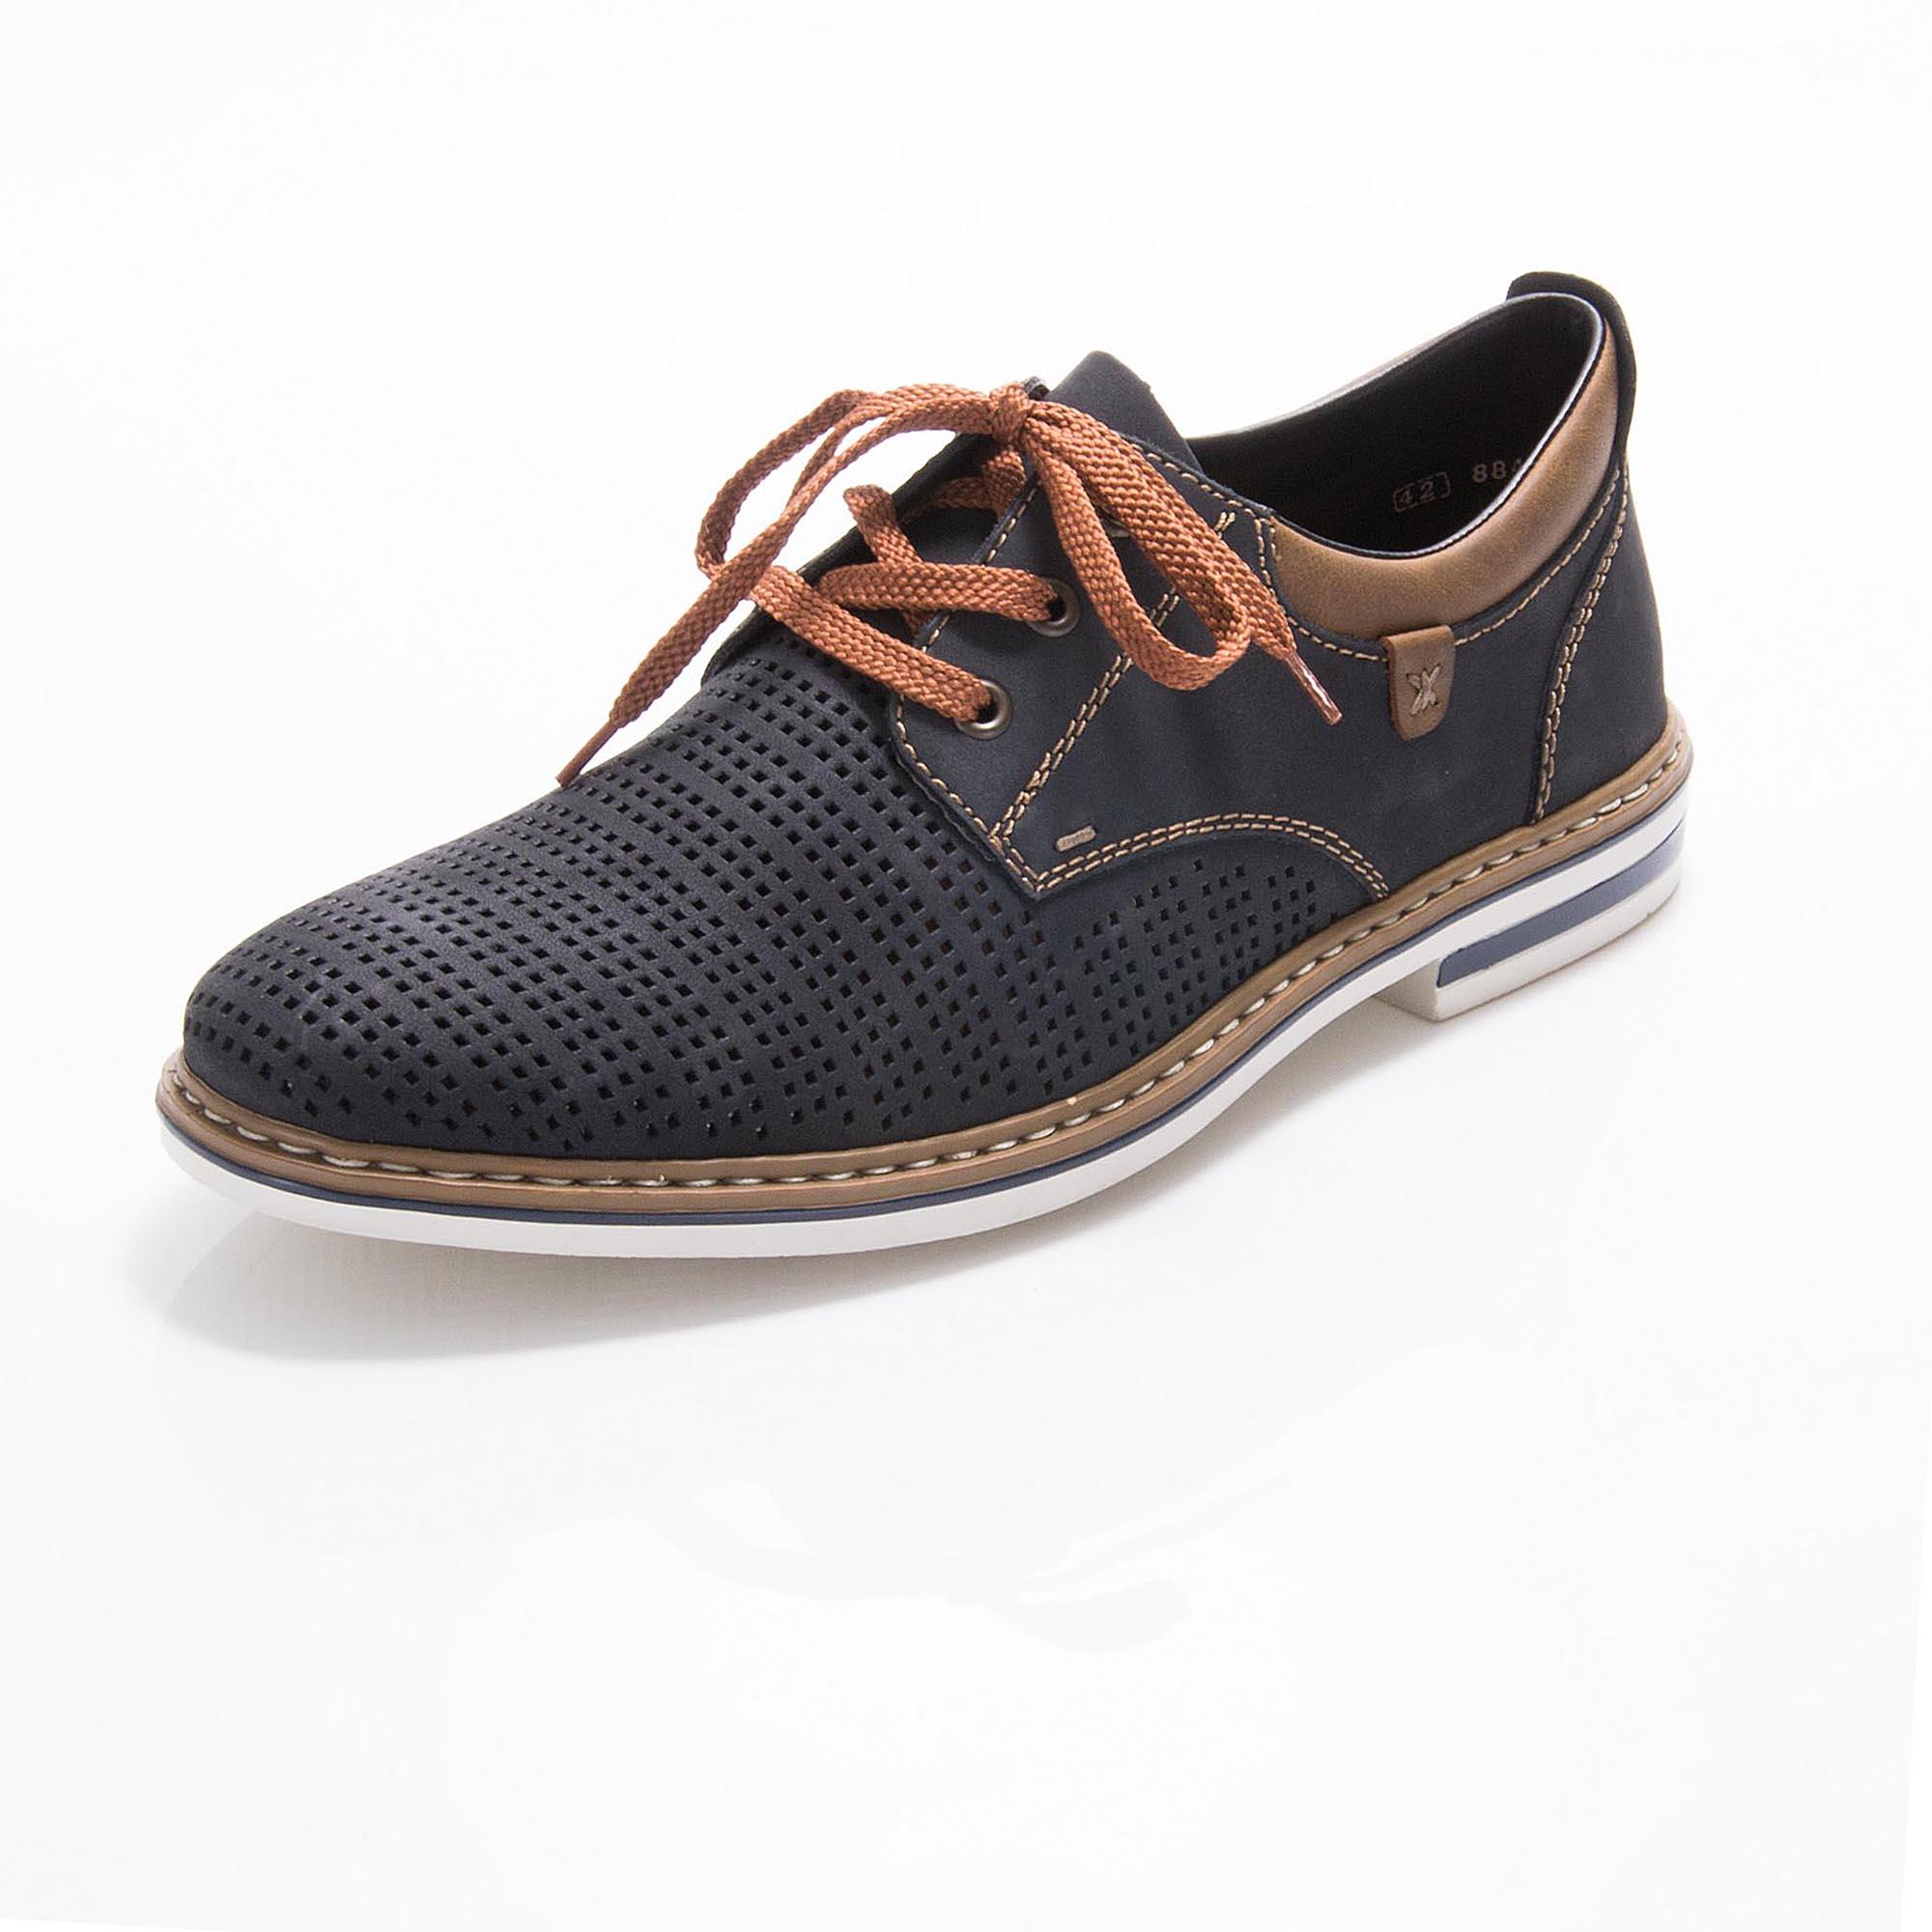 e3c7dc4618 detail Pánská obuv RIEKER B1436-14 BLAU F S 9